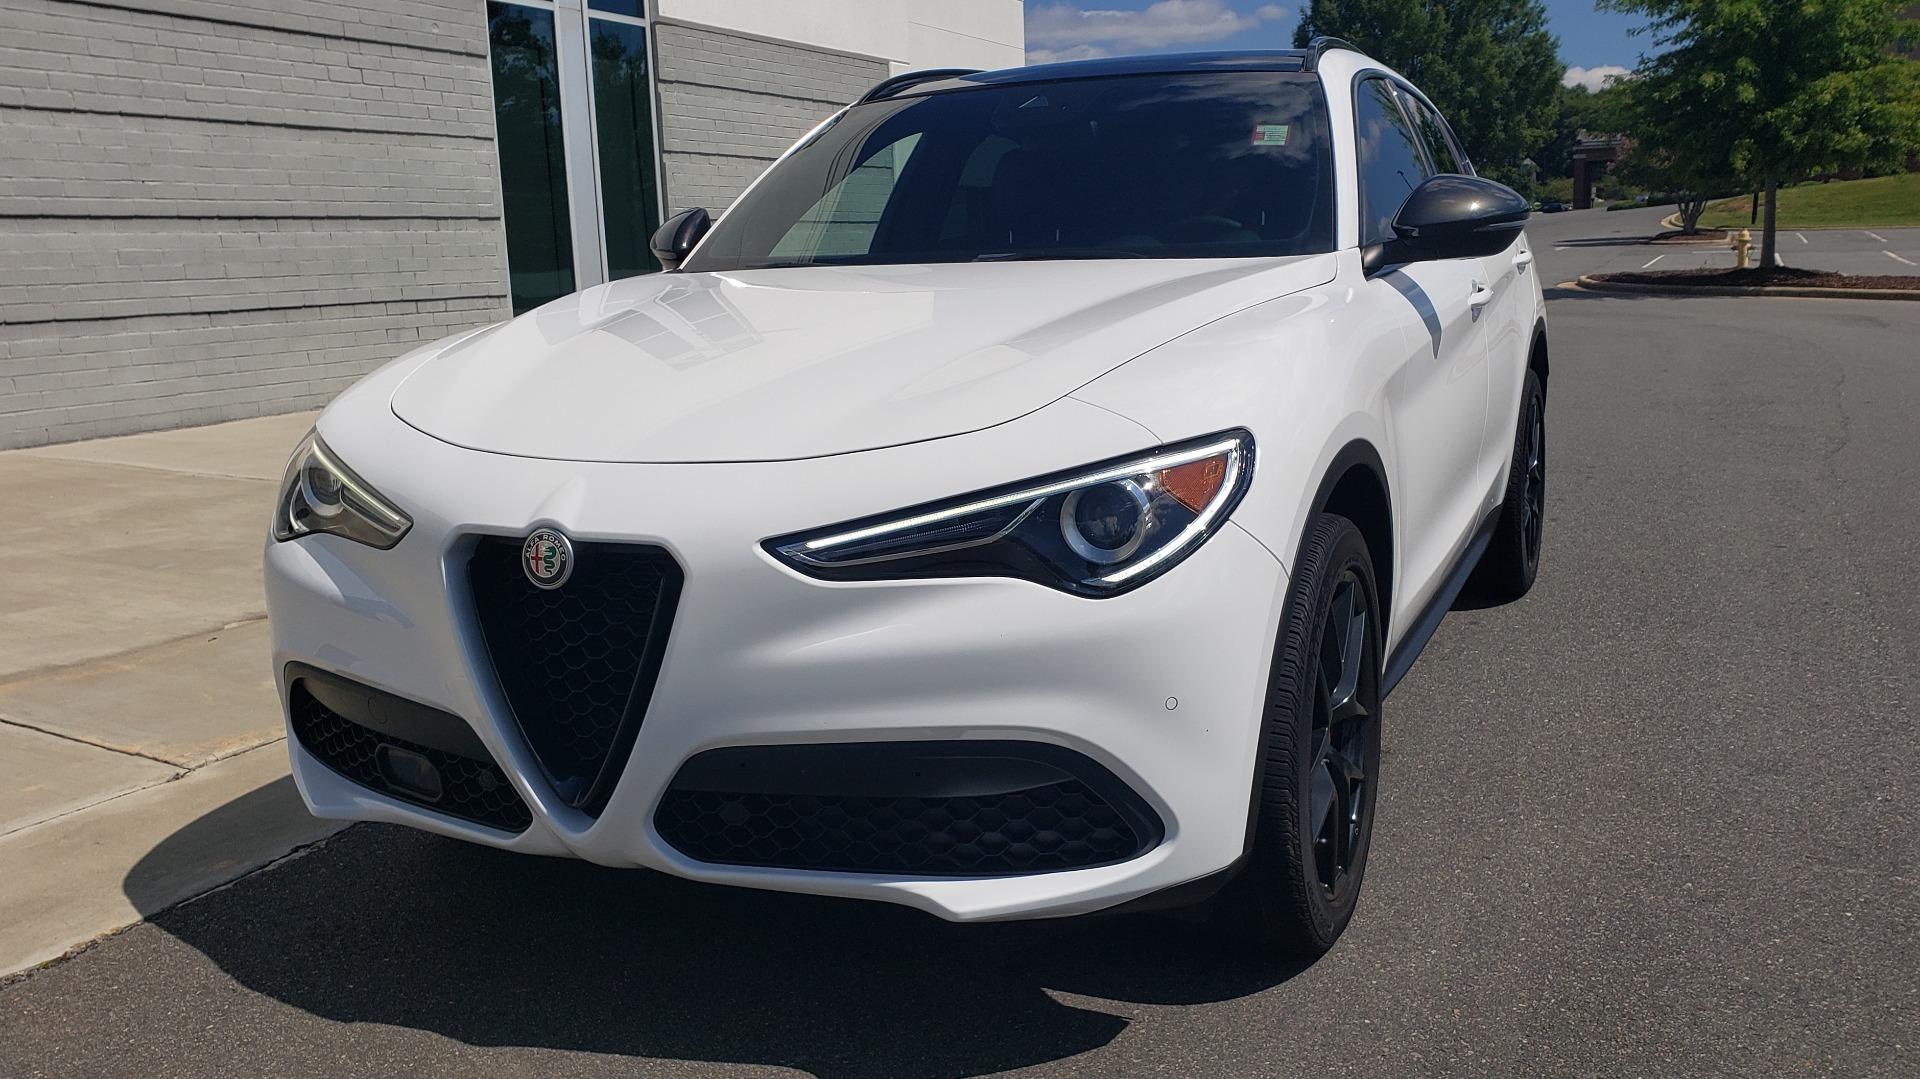 Used 2019 Alfa Romeo STELVIO TI SPORT AWD / 2.0L TURBO / 8-SPD AUTO / DRVR ASST / REARVIEW for sale $37,495 at Formula Imports in Charlotte NC 28227 6